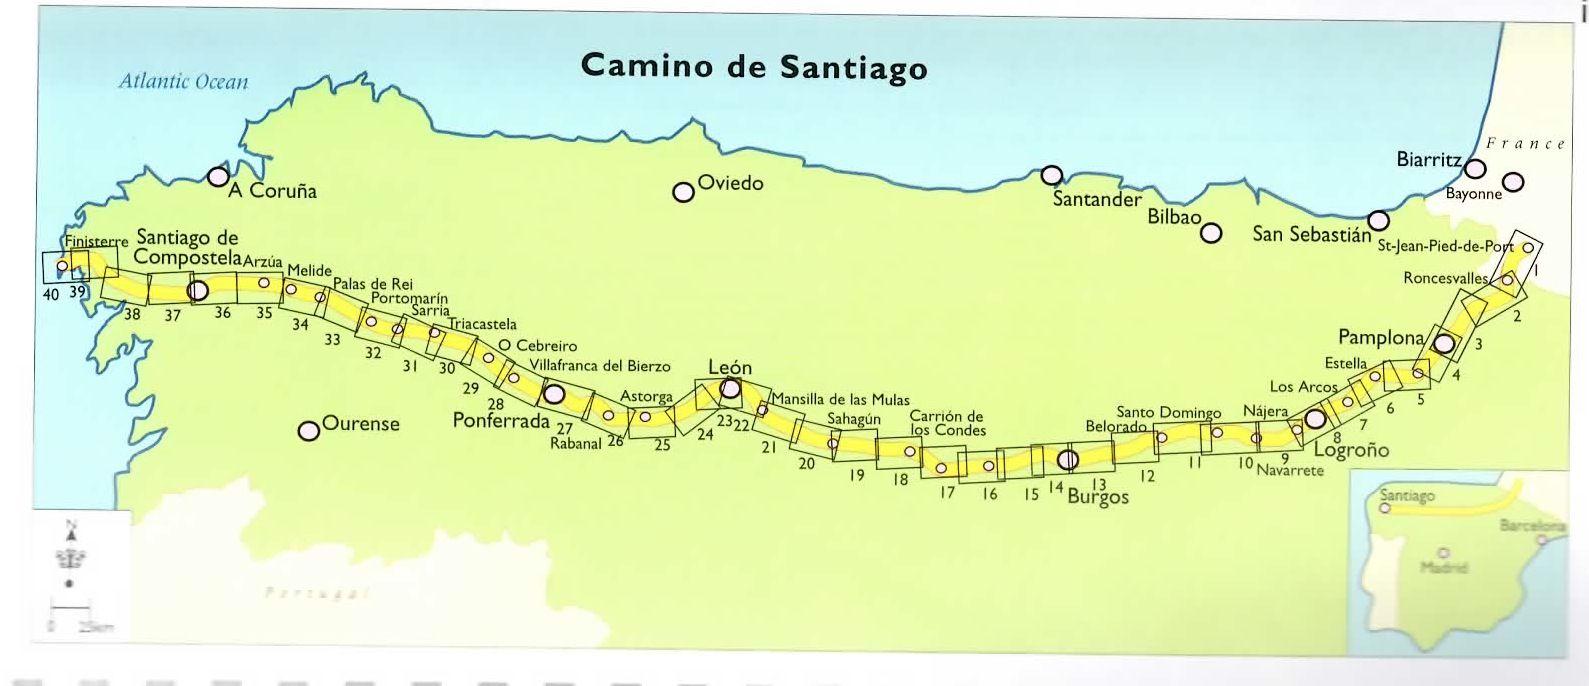 7b49752f66a6 In honor of my sister Kim Kolb walking Camino de Santiago. Here s her path  - camino de santiago map - Google Search